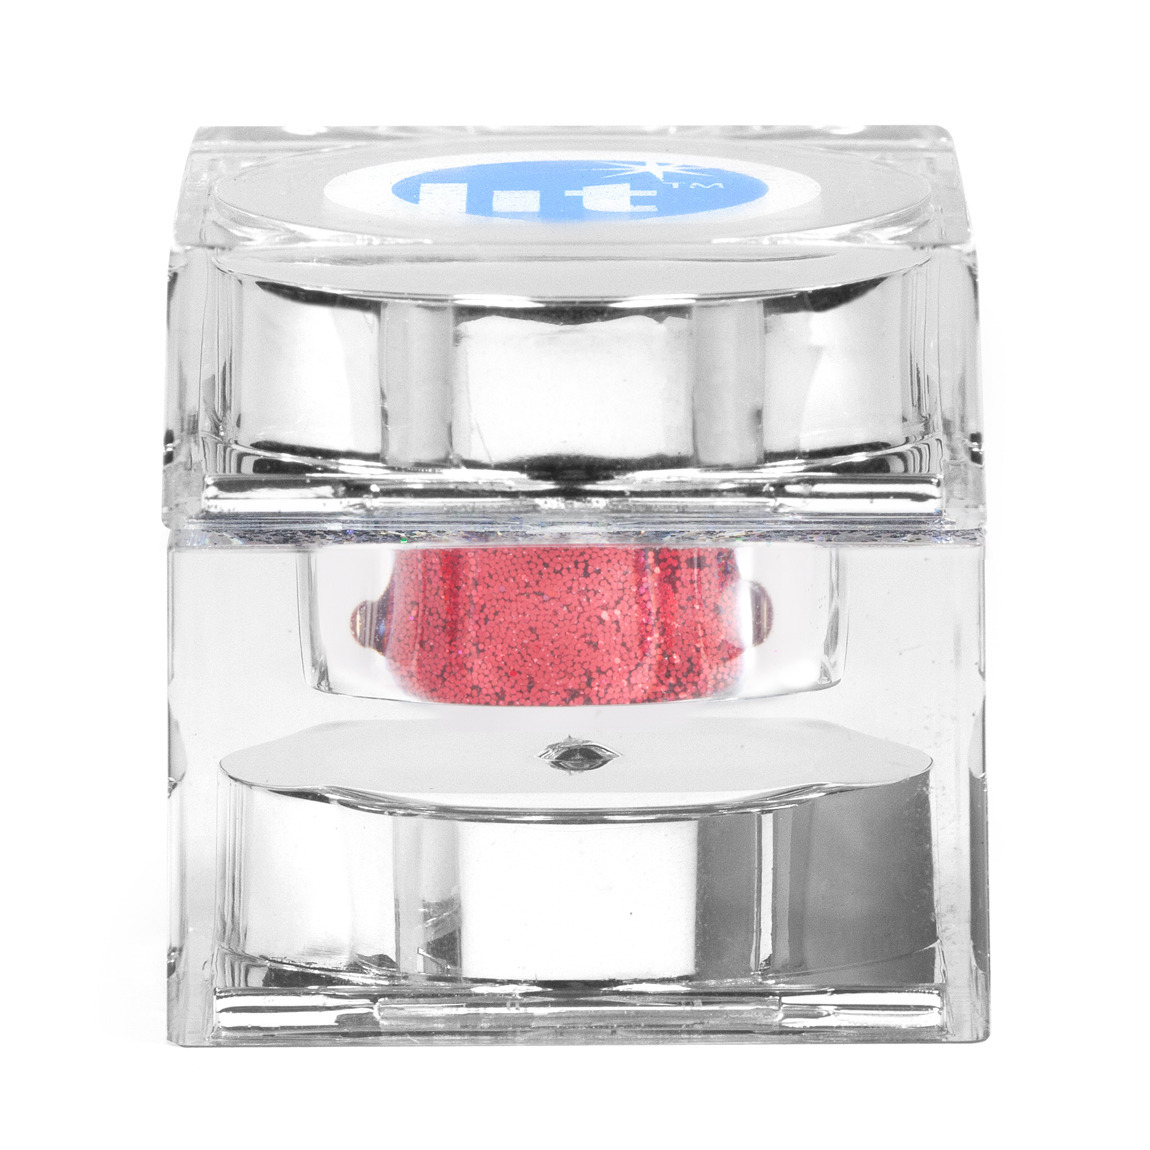 Lit Cosmetics Lit Glitter Vixen S3 (Solid)